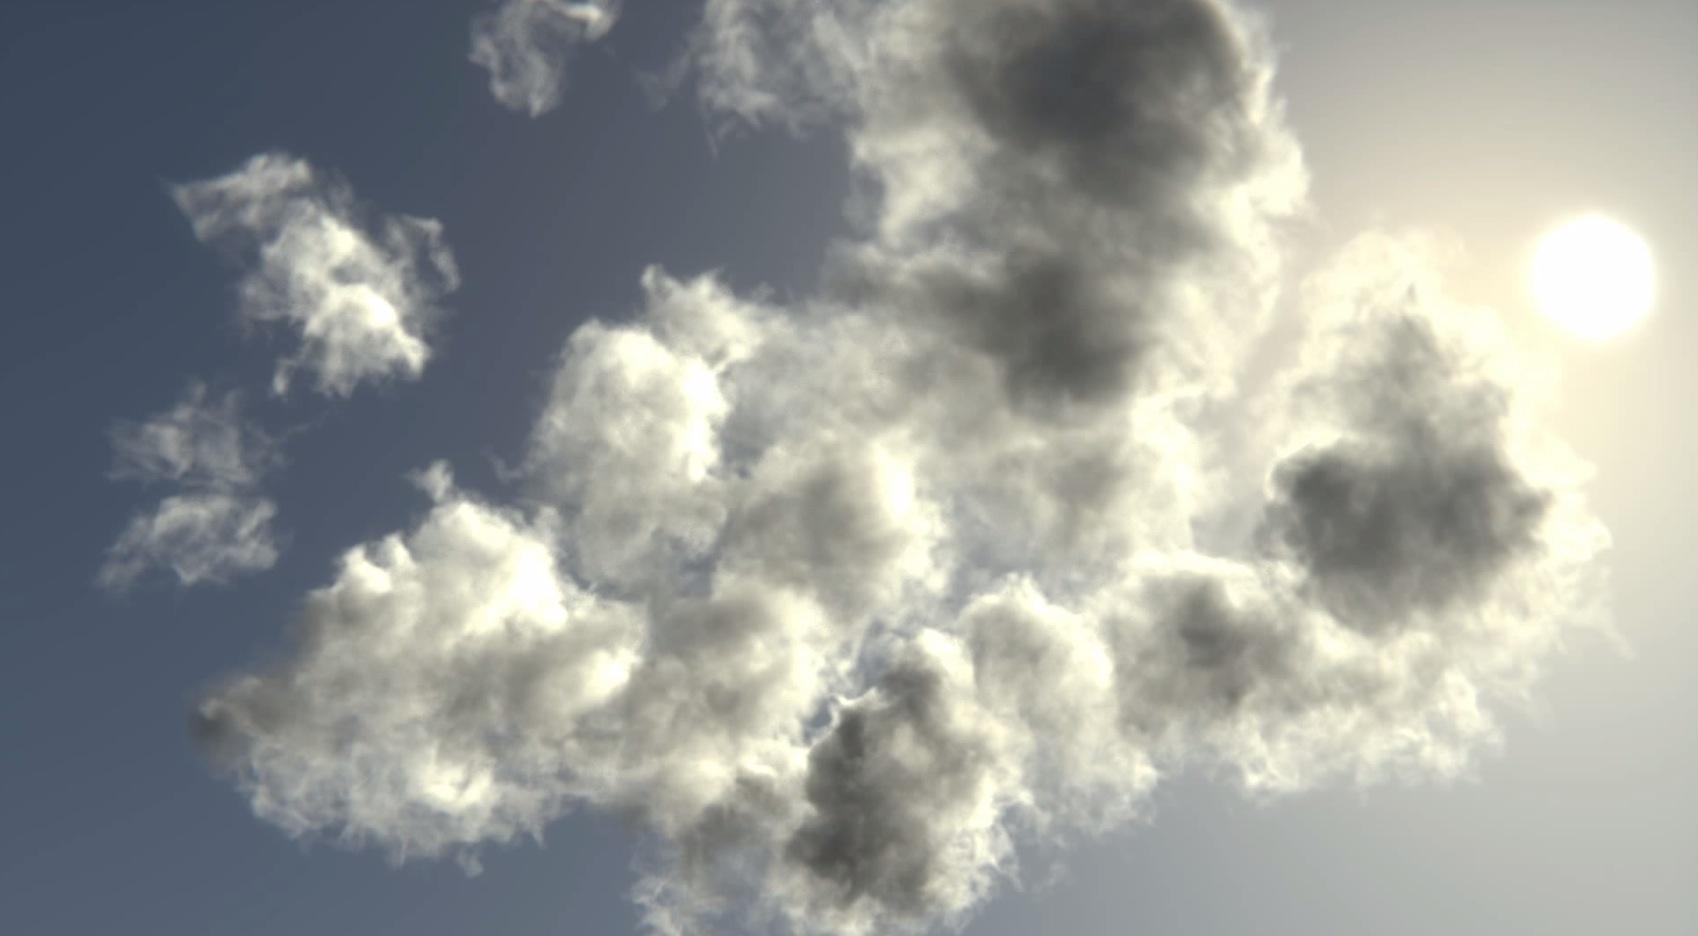 Creating volumetric clouds with smoke sim - BlenderNation